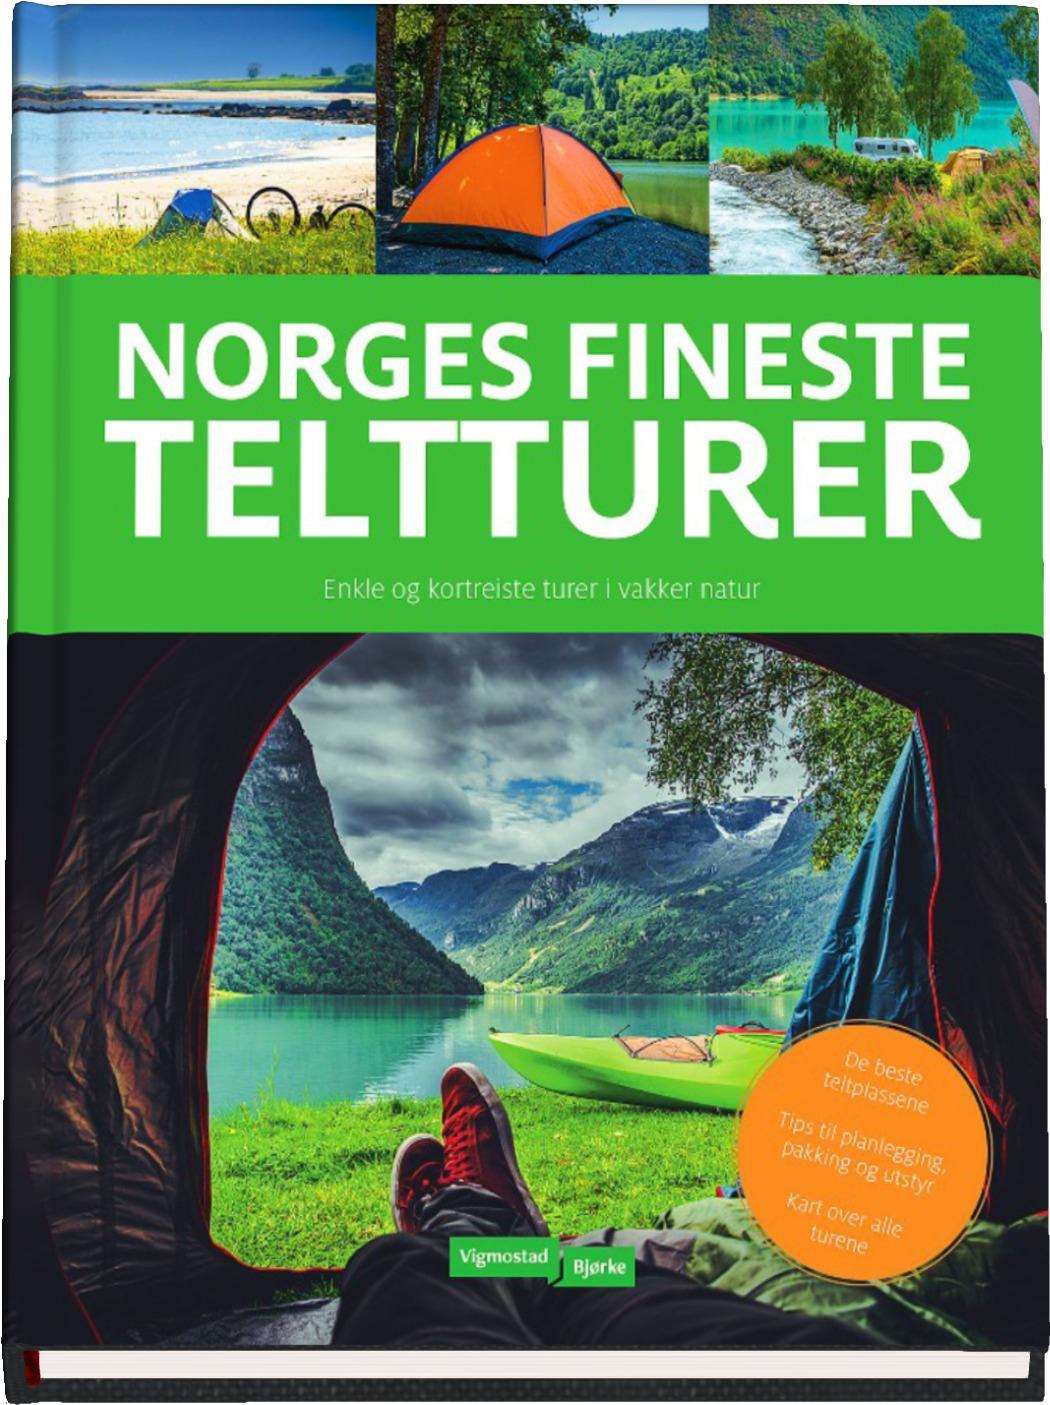 Norges fineste teltturer om Norgesferien av Terje Karlung